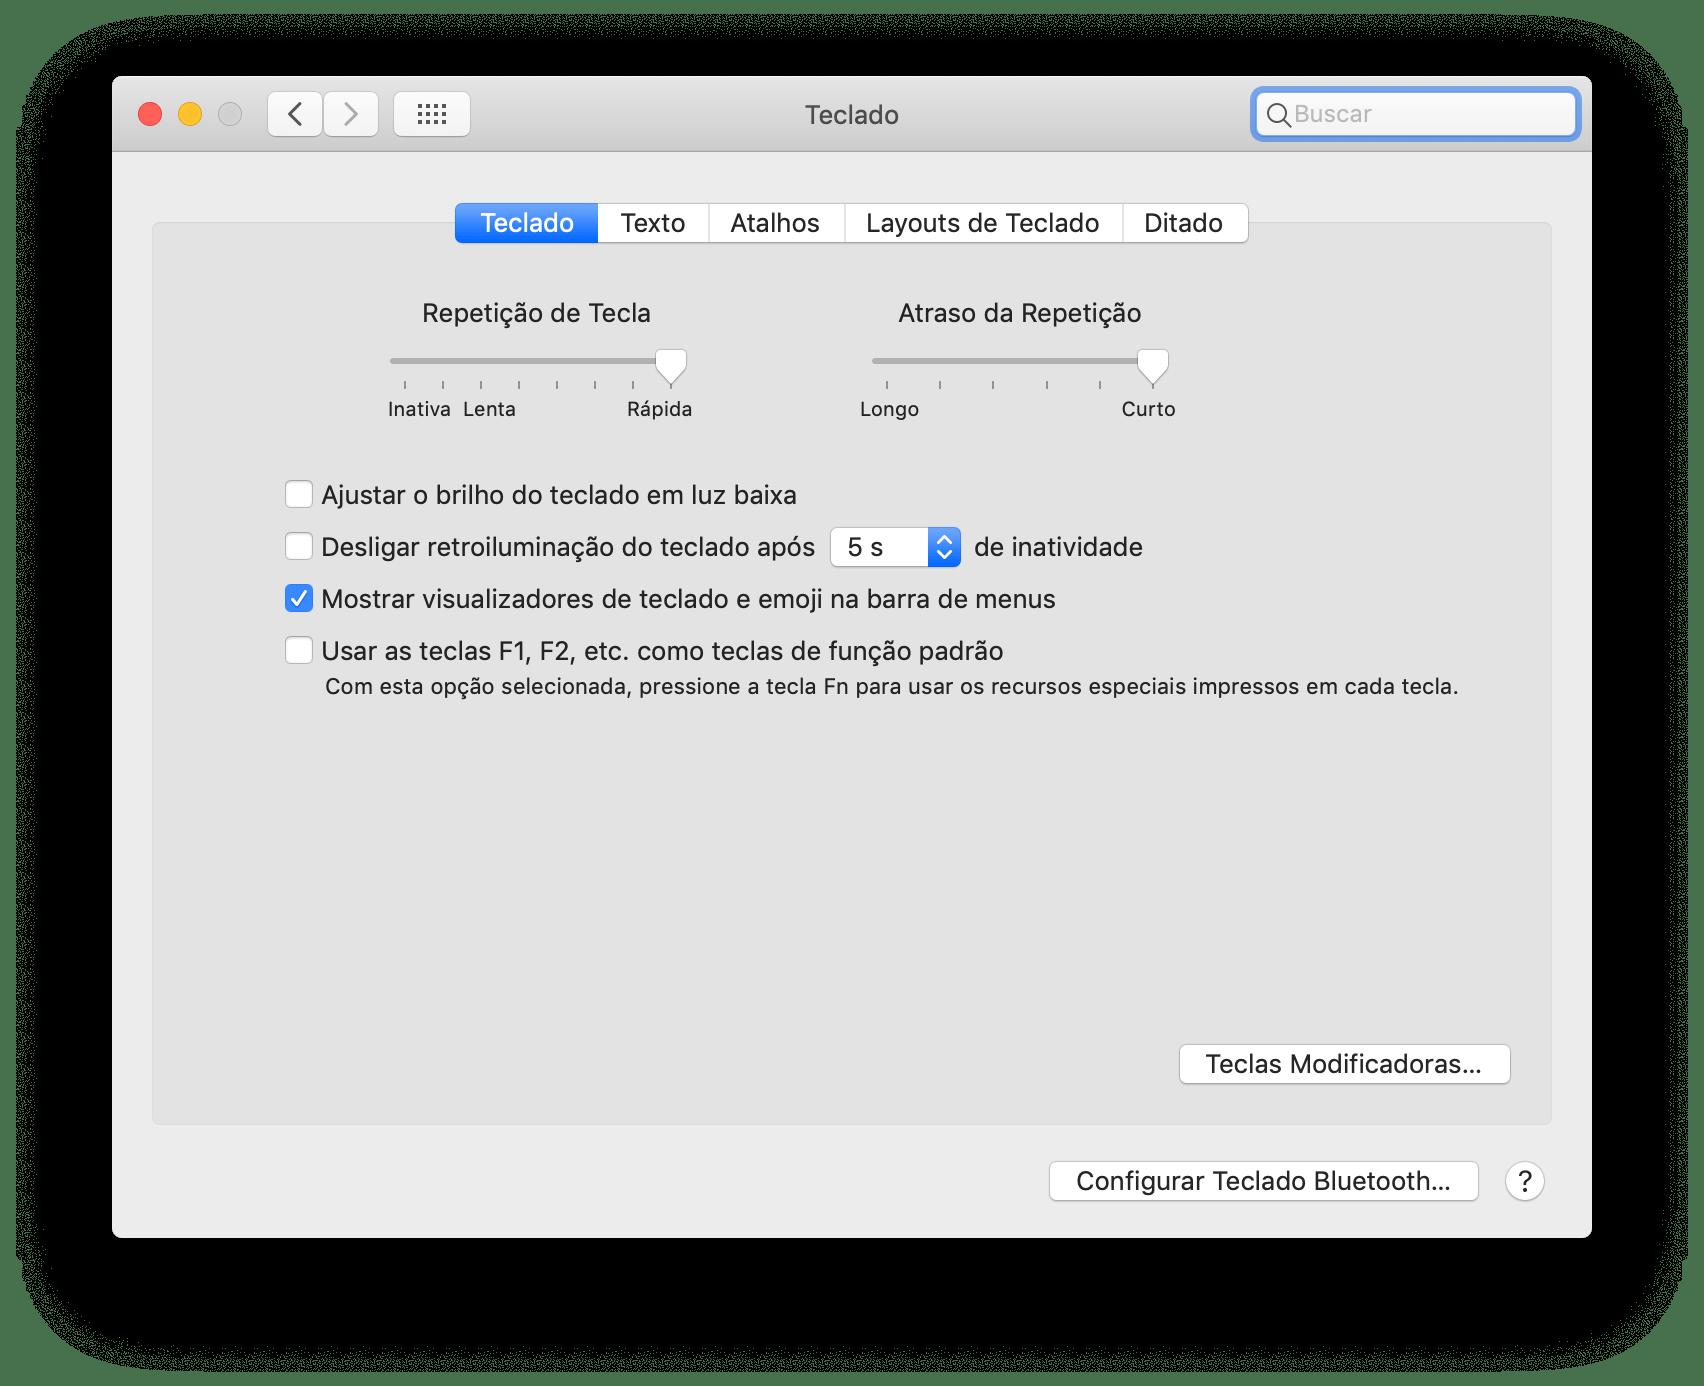 Viewing emojis and special symbols in macOS